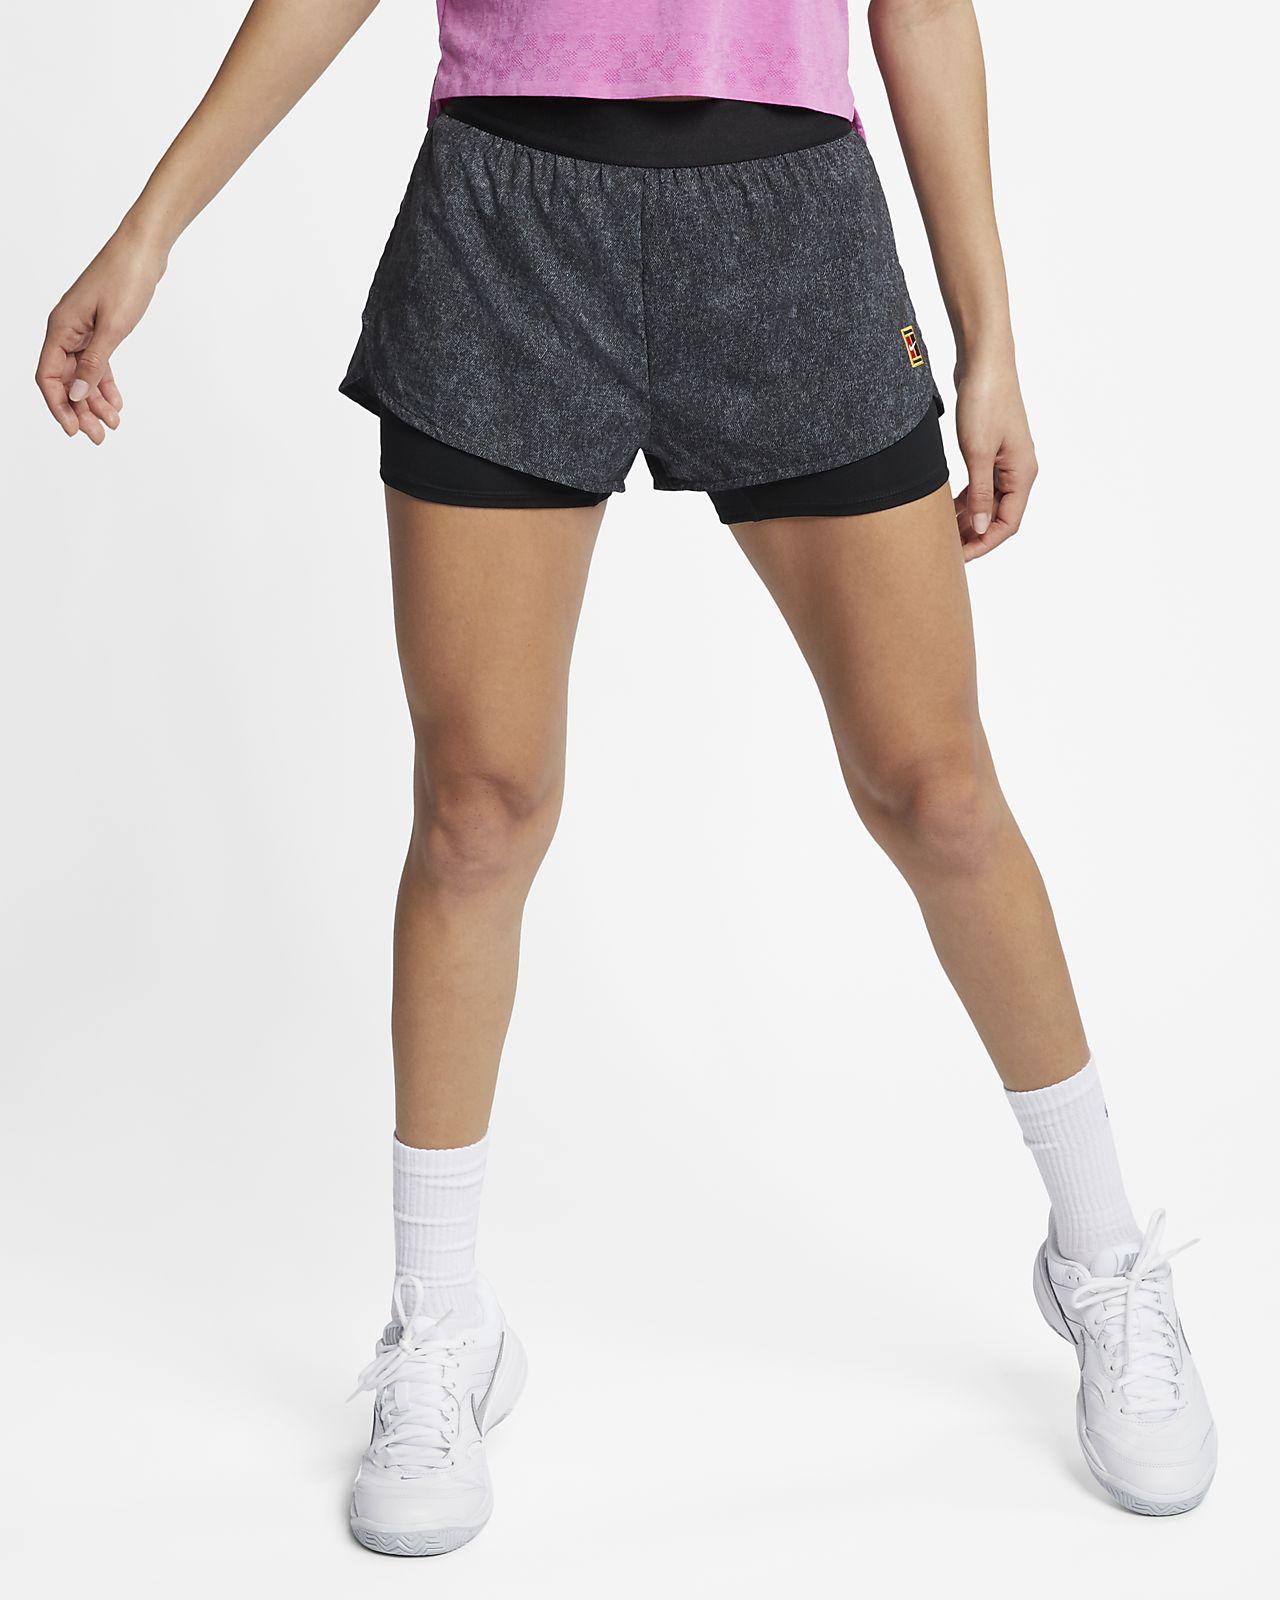 NikeCourt Flex Women's Printed Tennis Shorts